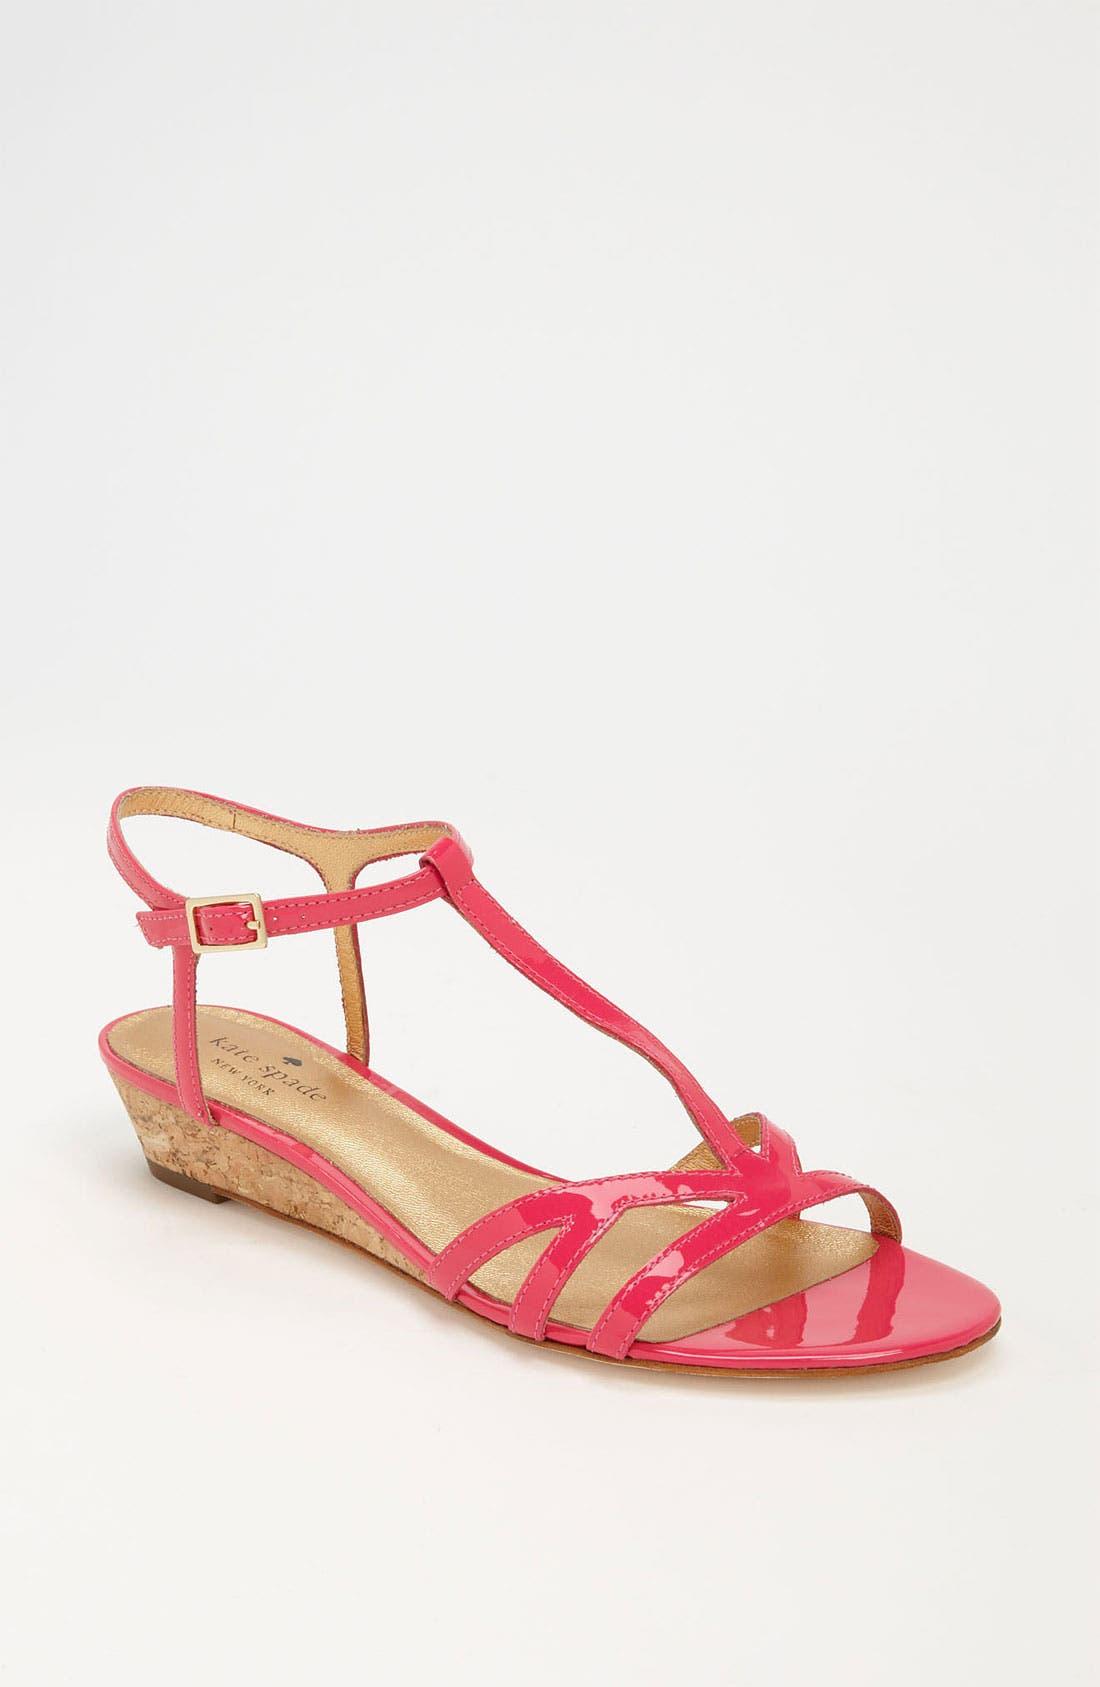 Alternate Image 1 Selected - kate spade new york 'violet' sandal